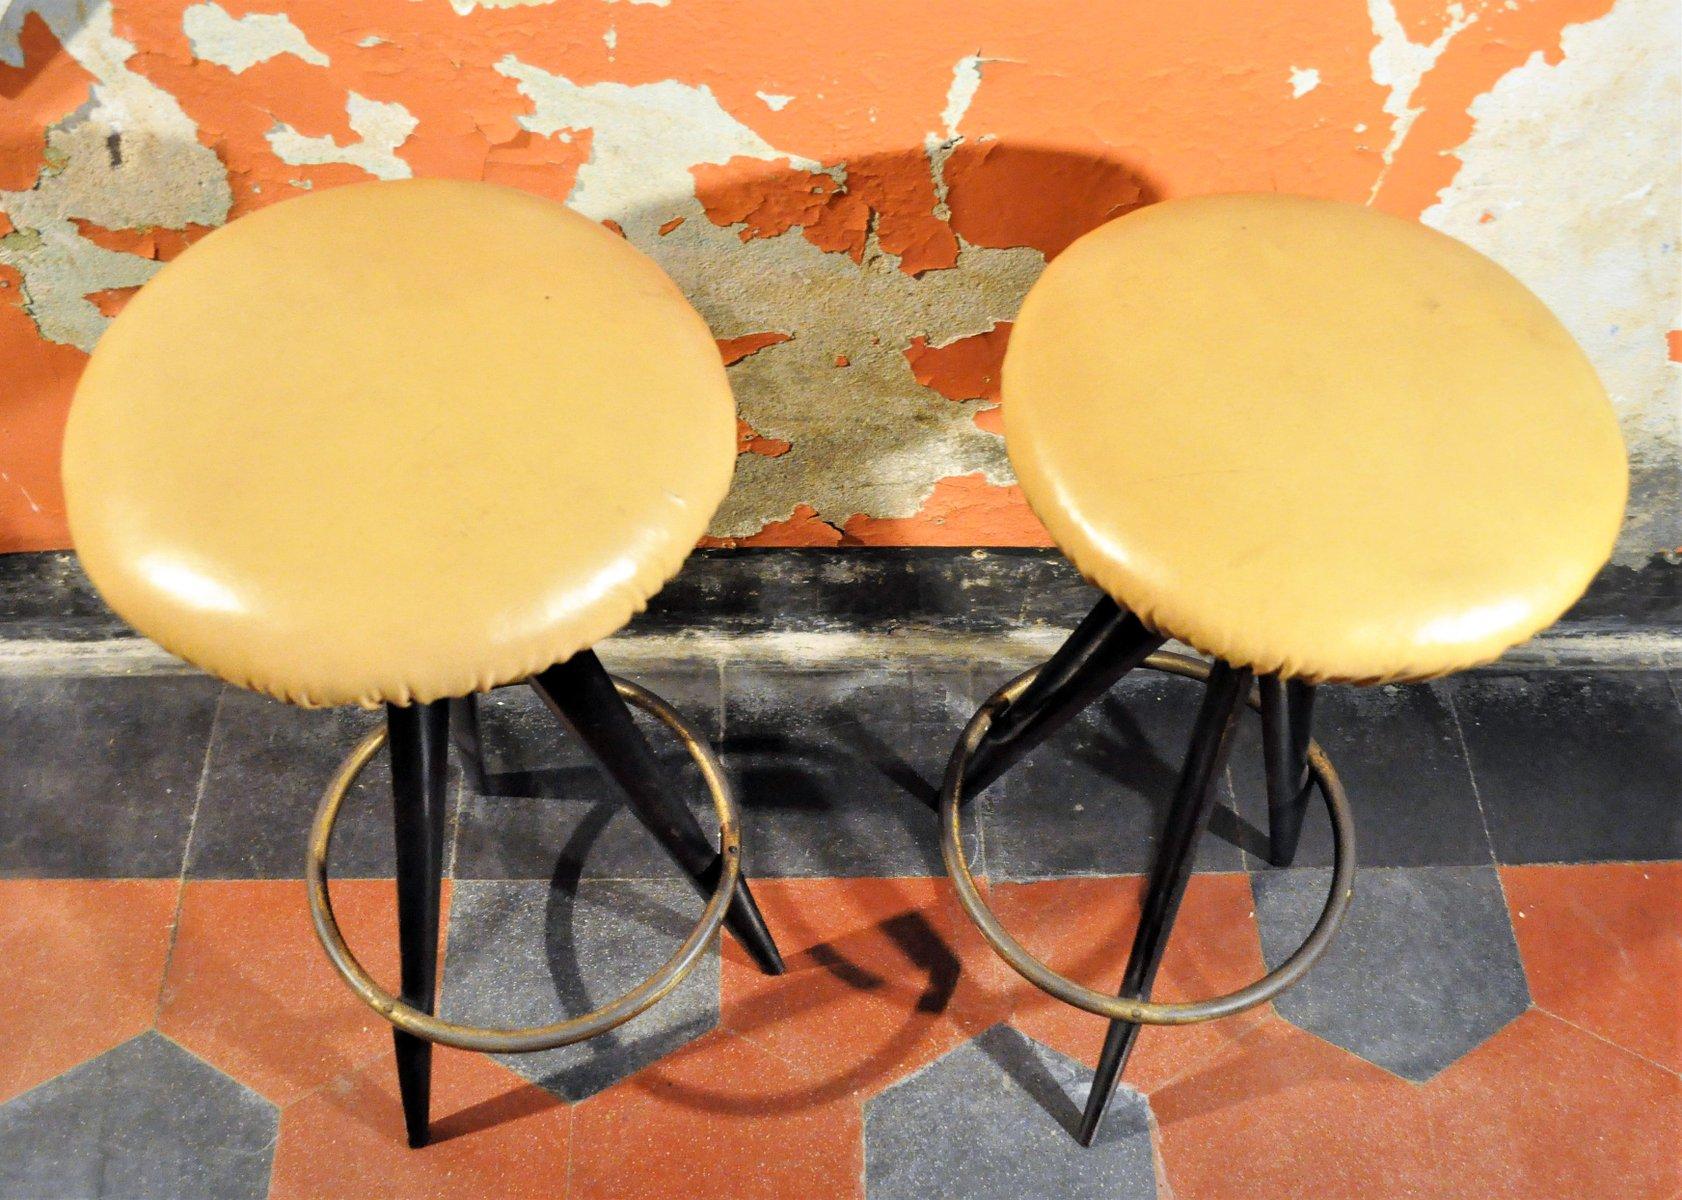 Sgabelli da bar di osvaldo borsani per atelier borsani varedo